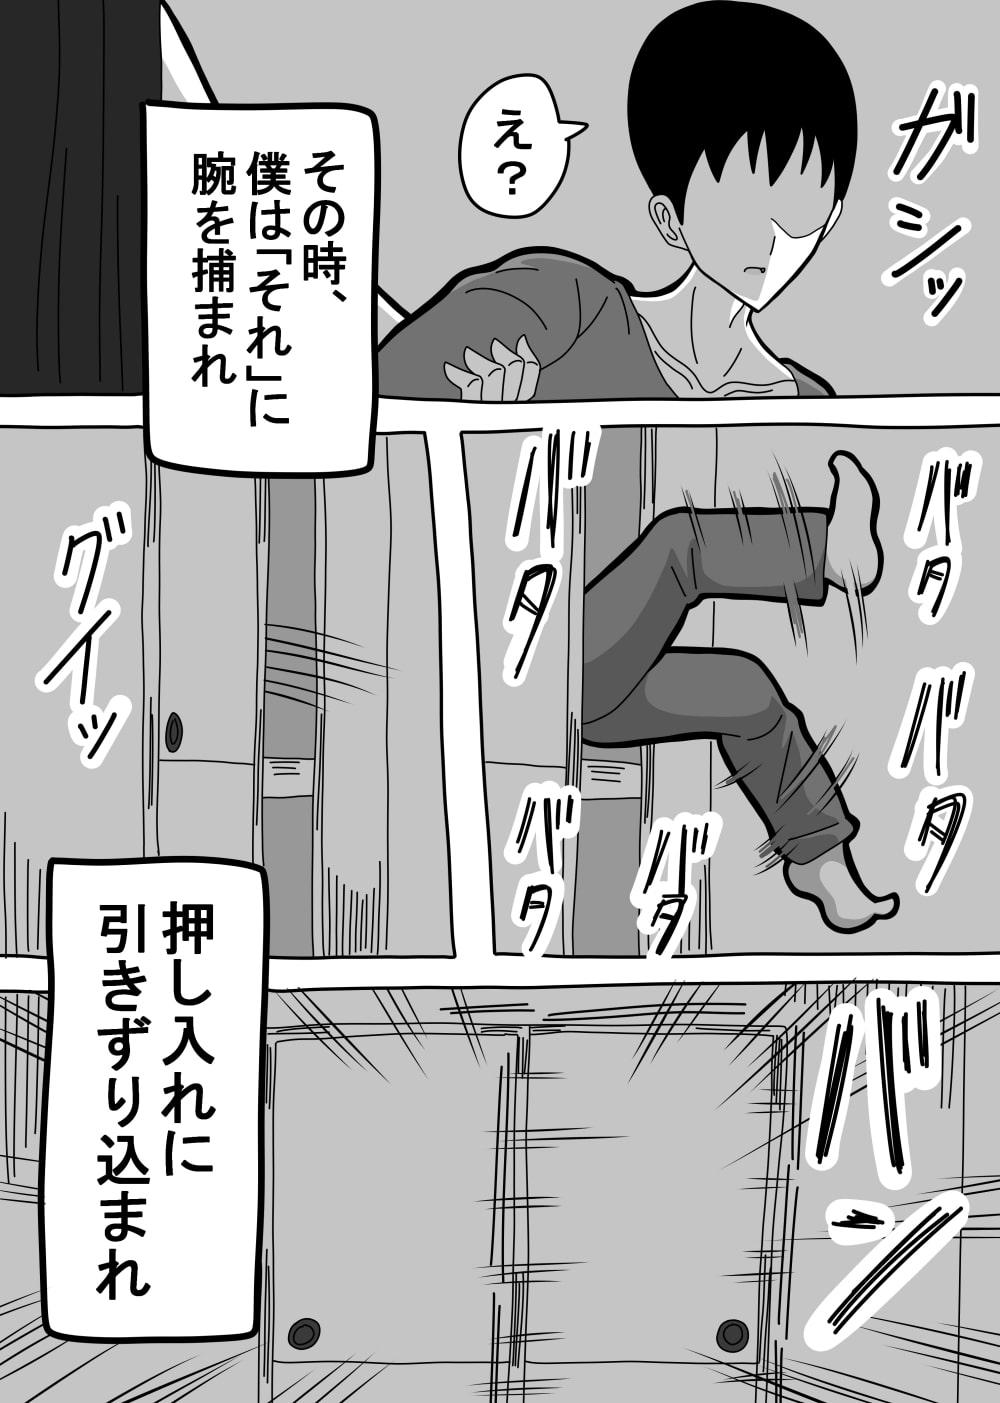 RJ343816 押入ノ怪 [20210918]